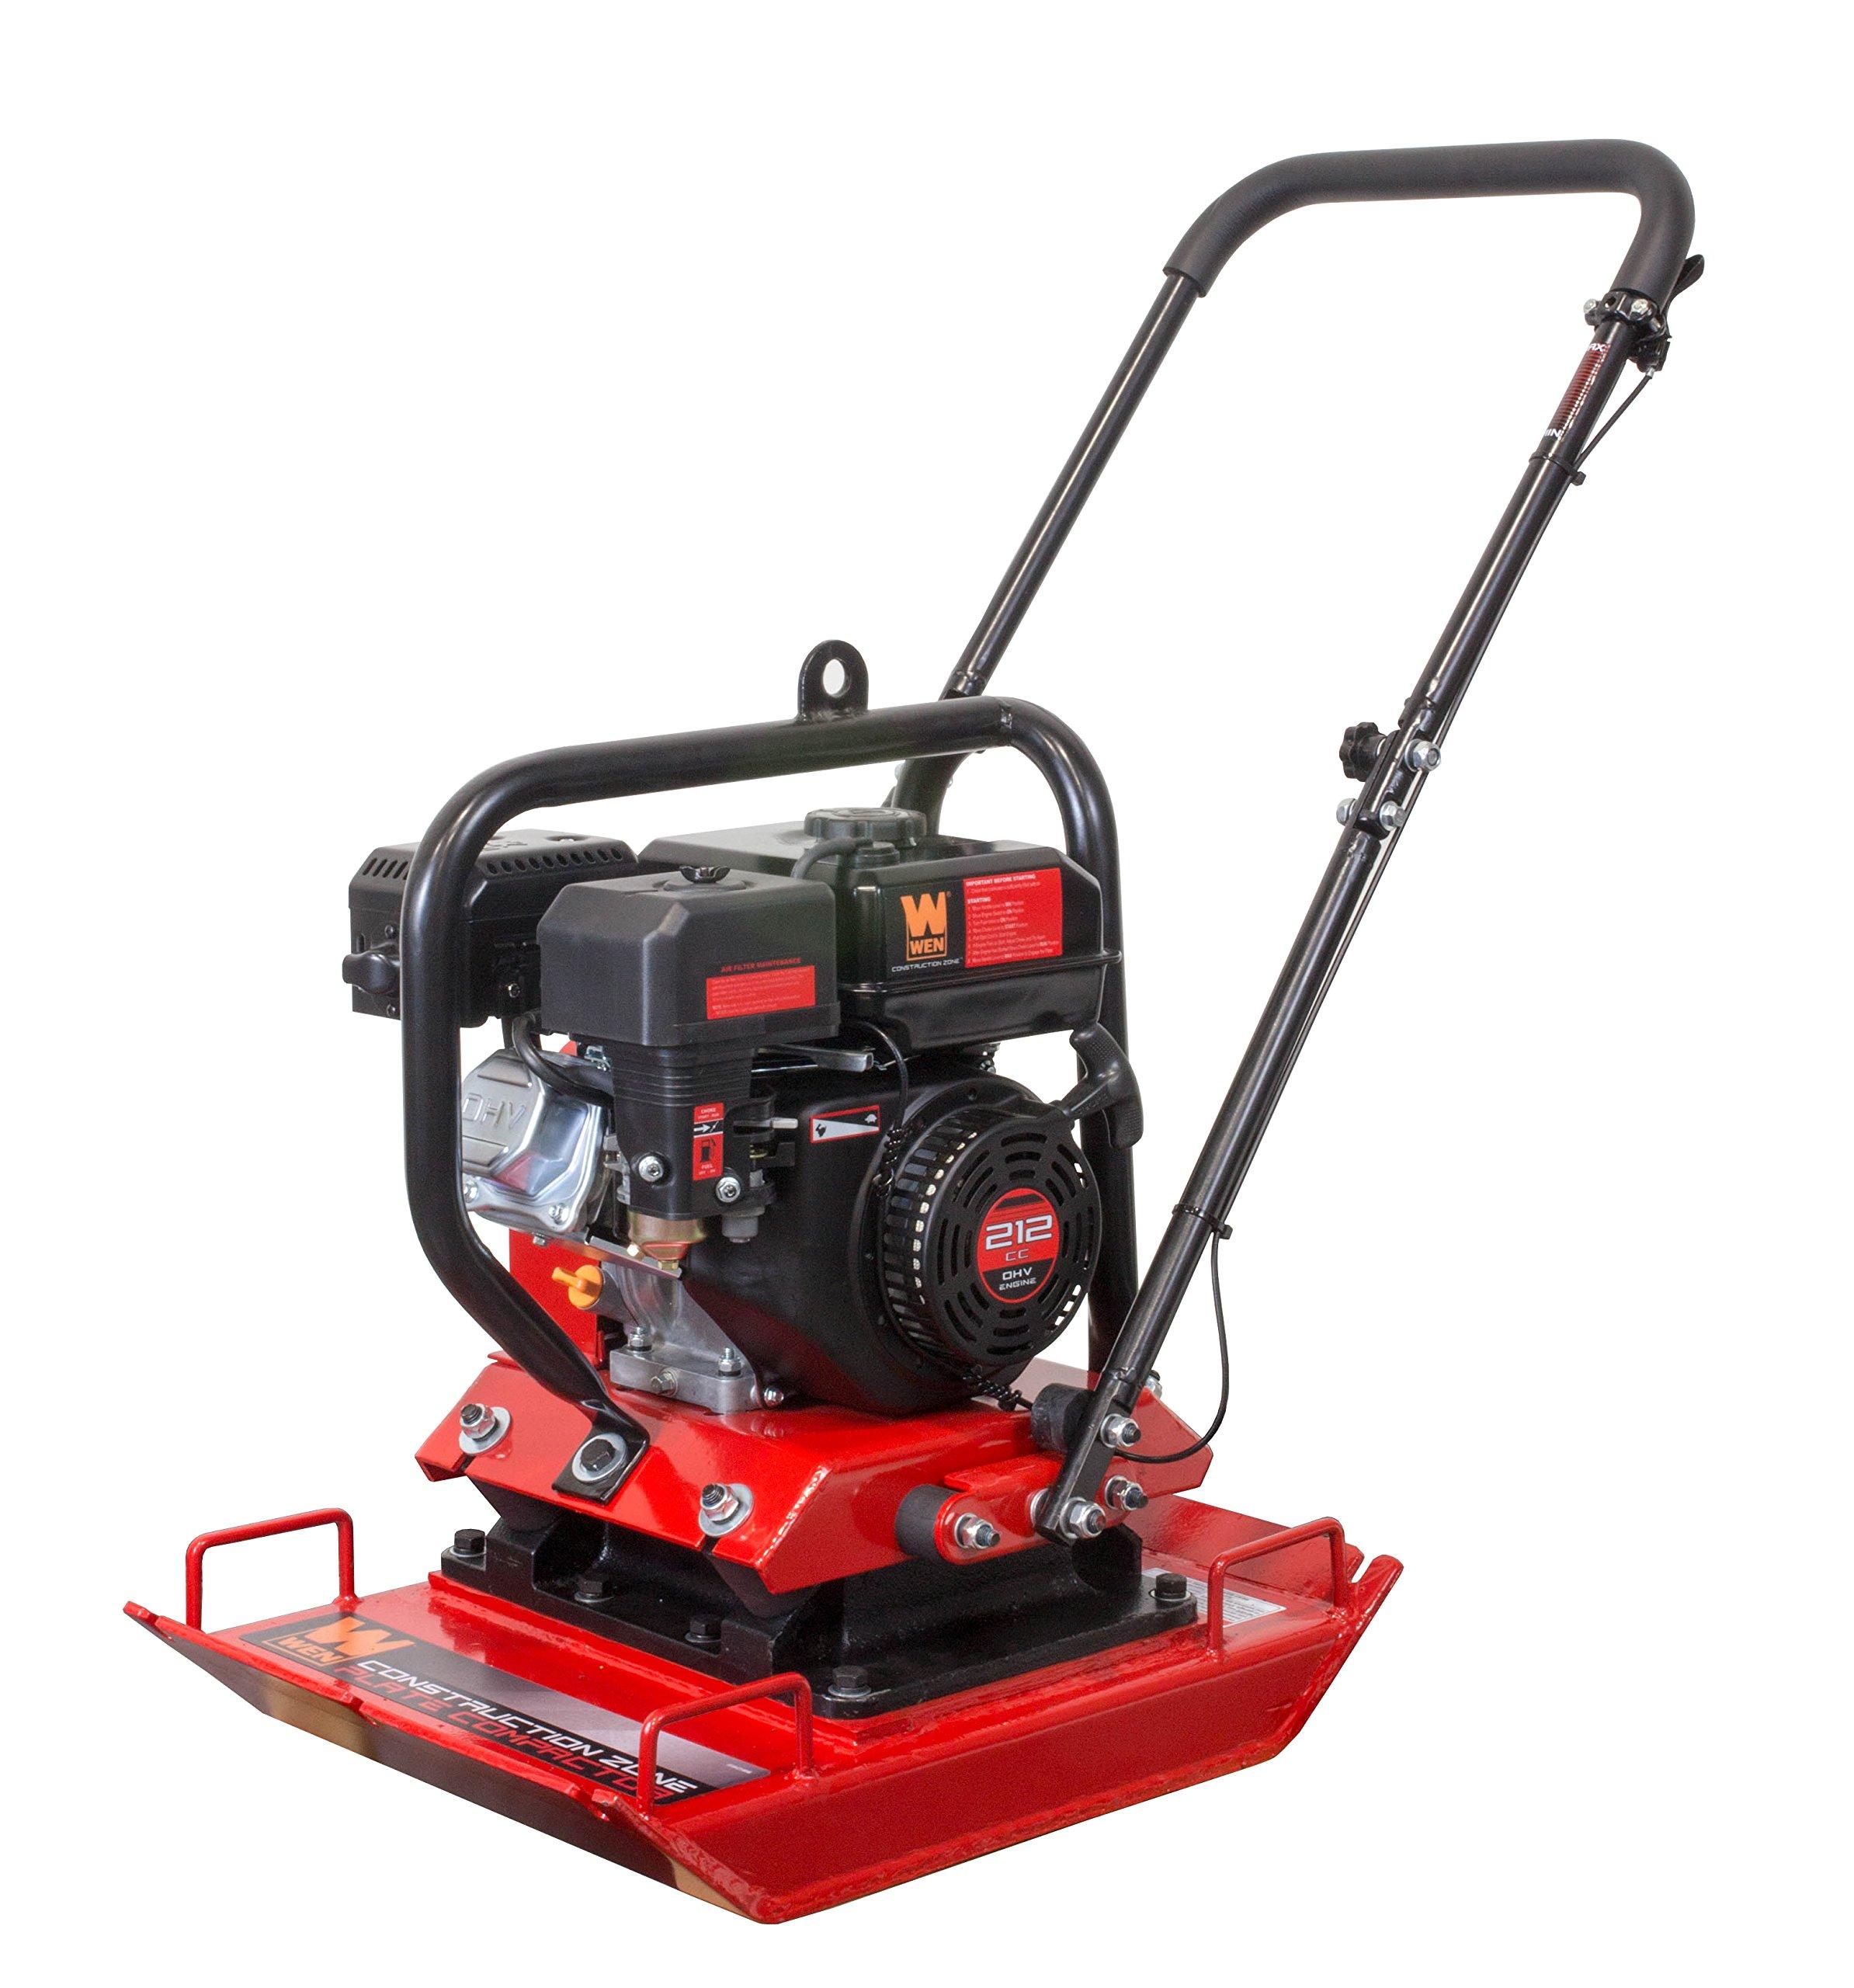 WEN 56035 Construction Zone 4,496-Pound Capacity Plate Compactor, Vibratory Asphalt/Soil Plate by WEN